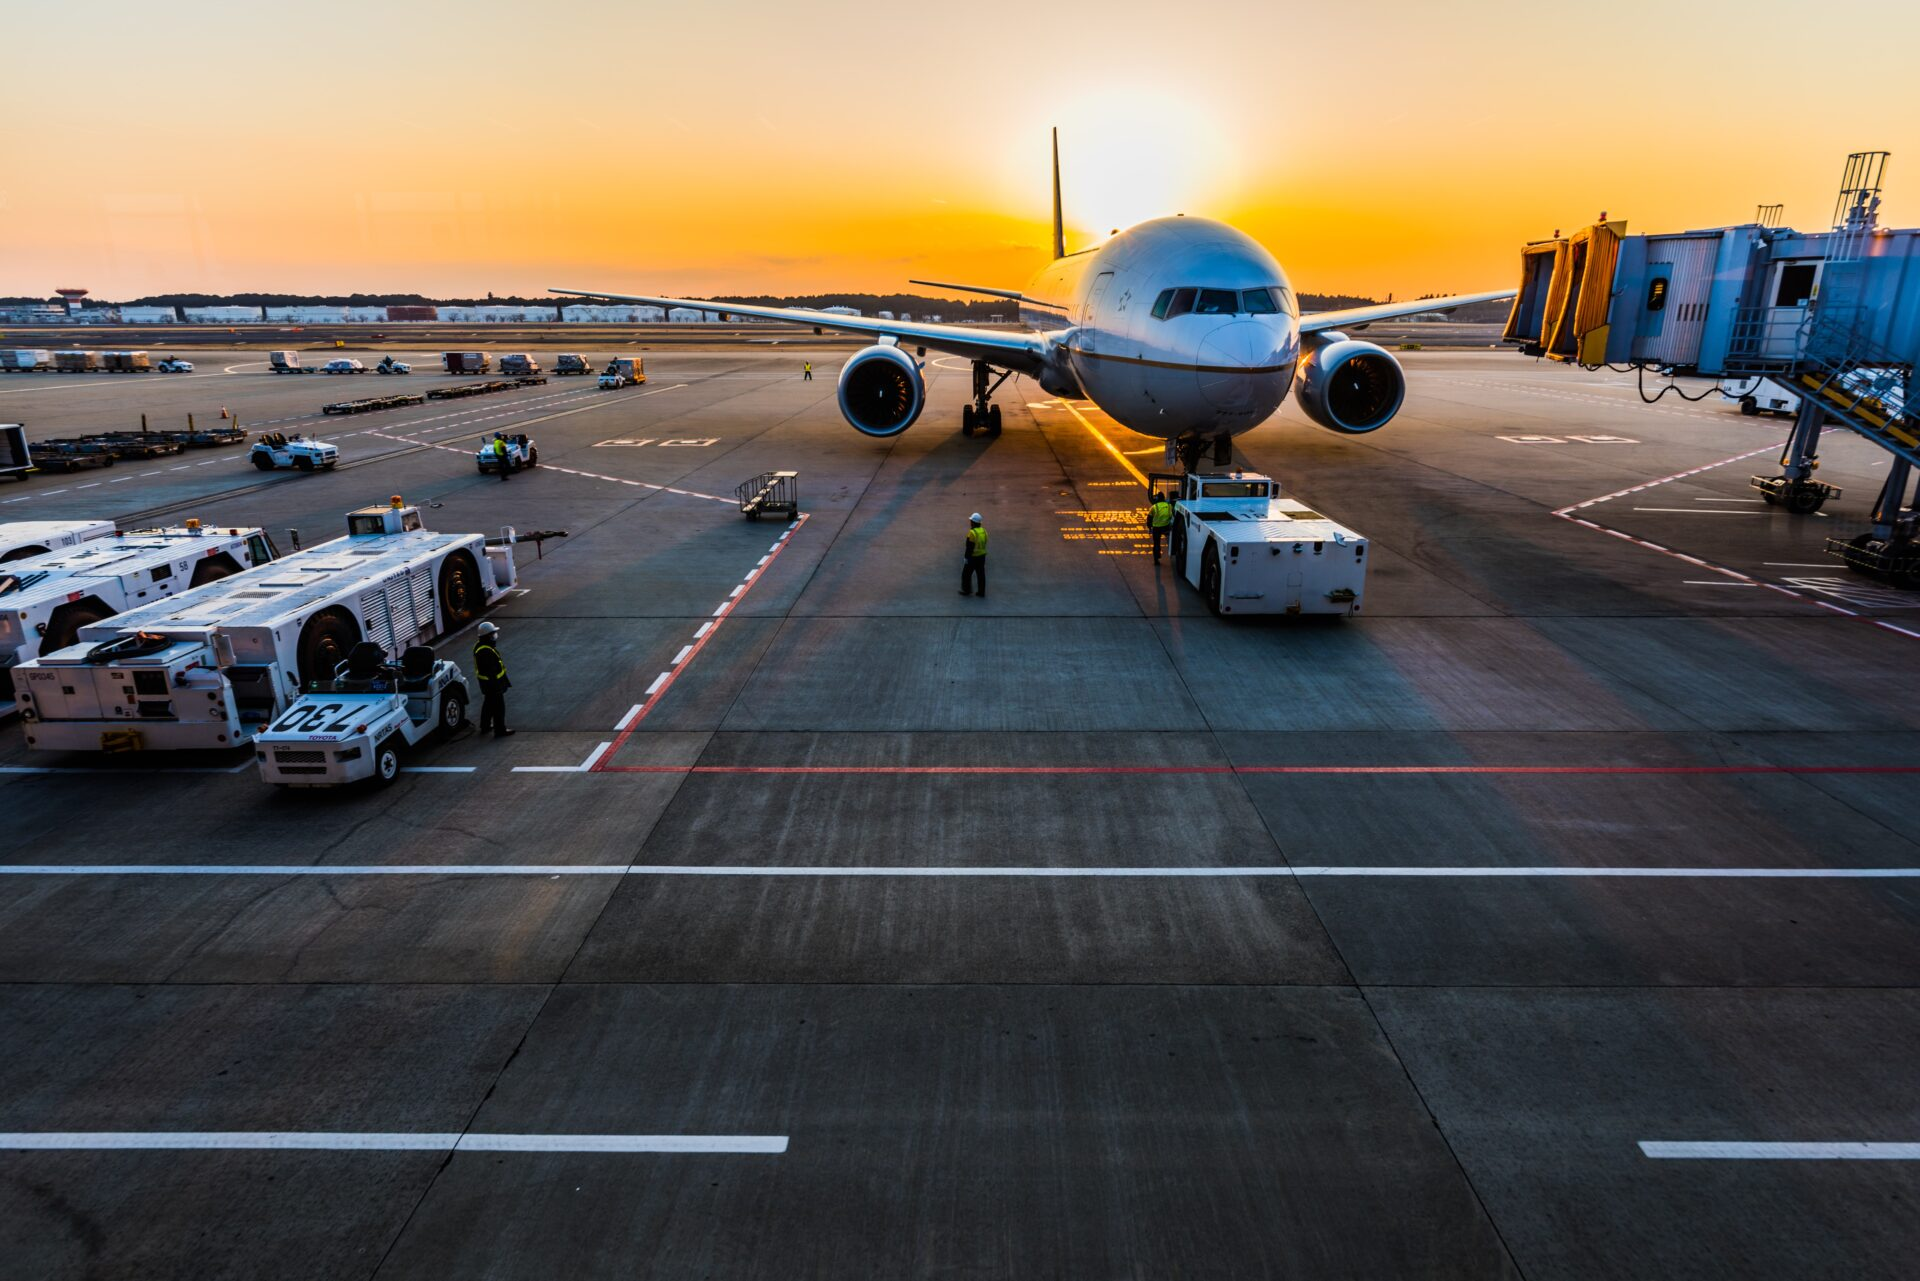 plane-22-448x249-c-default.jpg